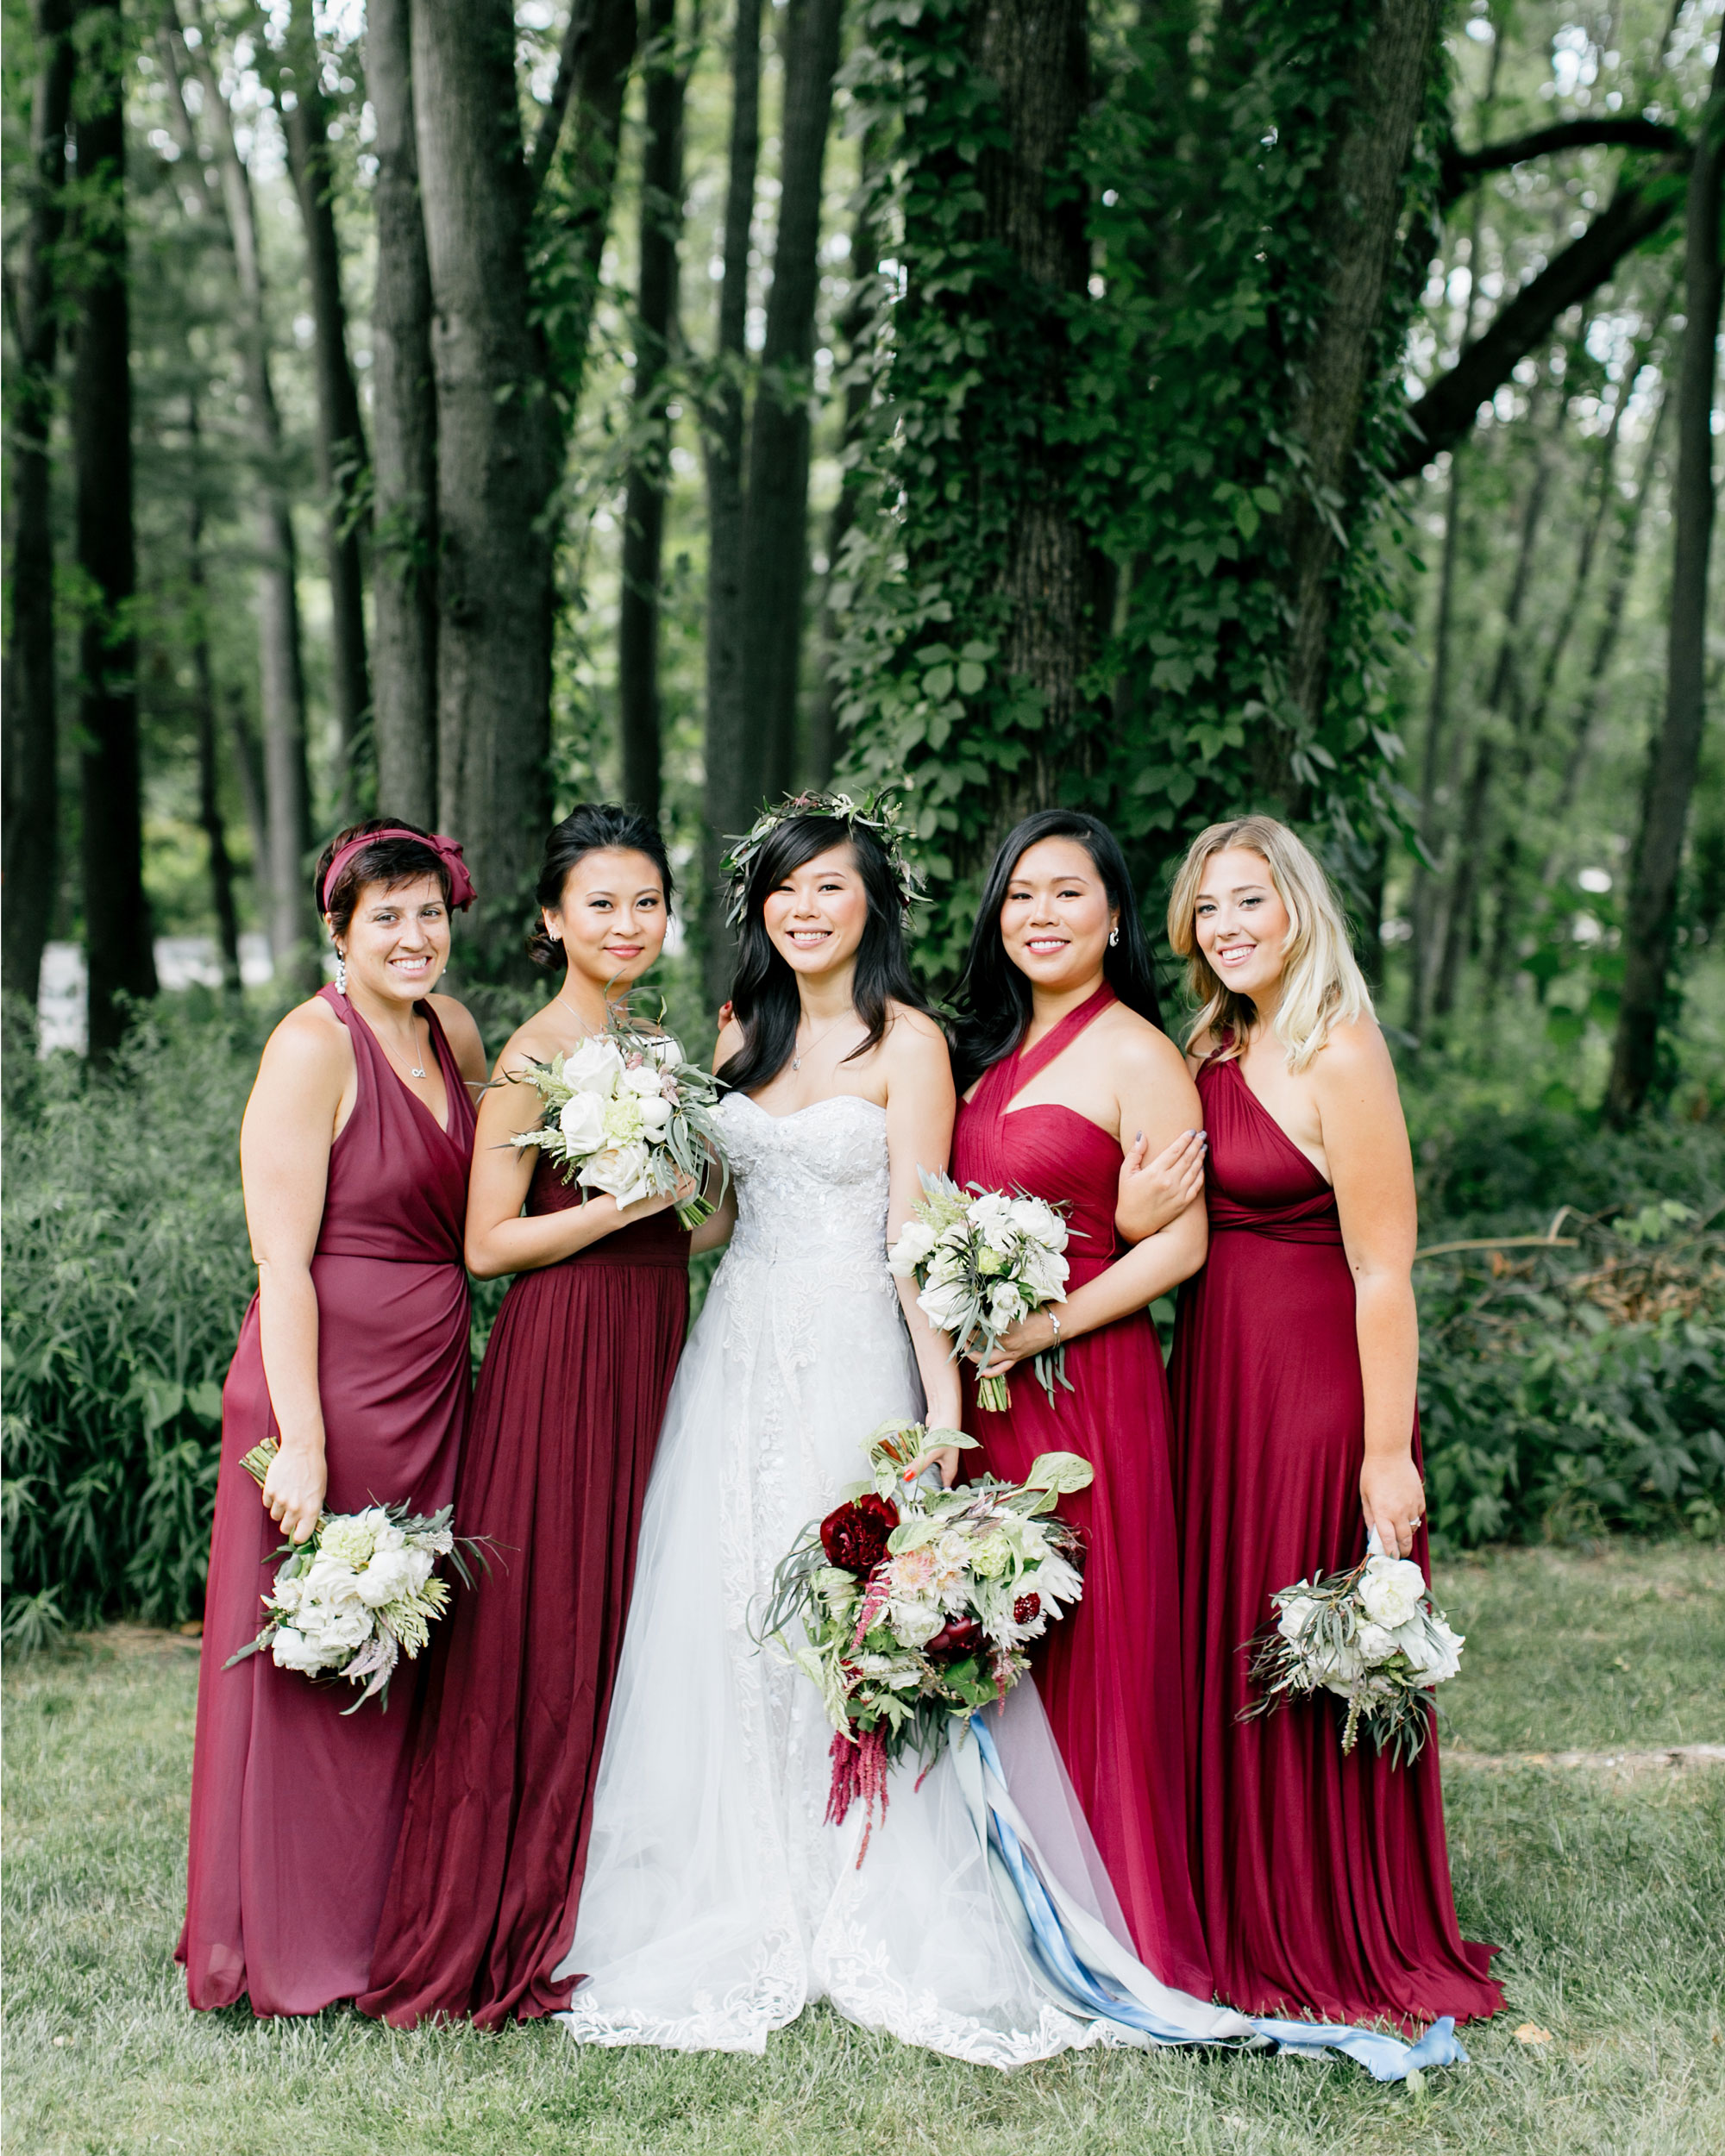 susan-tom-wedding-bridesmaids-079-s112692-0316.jpg